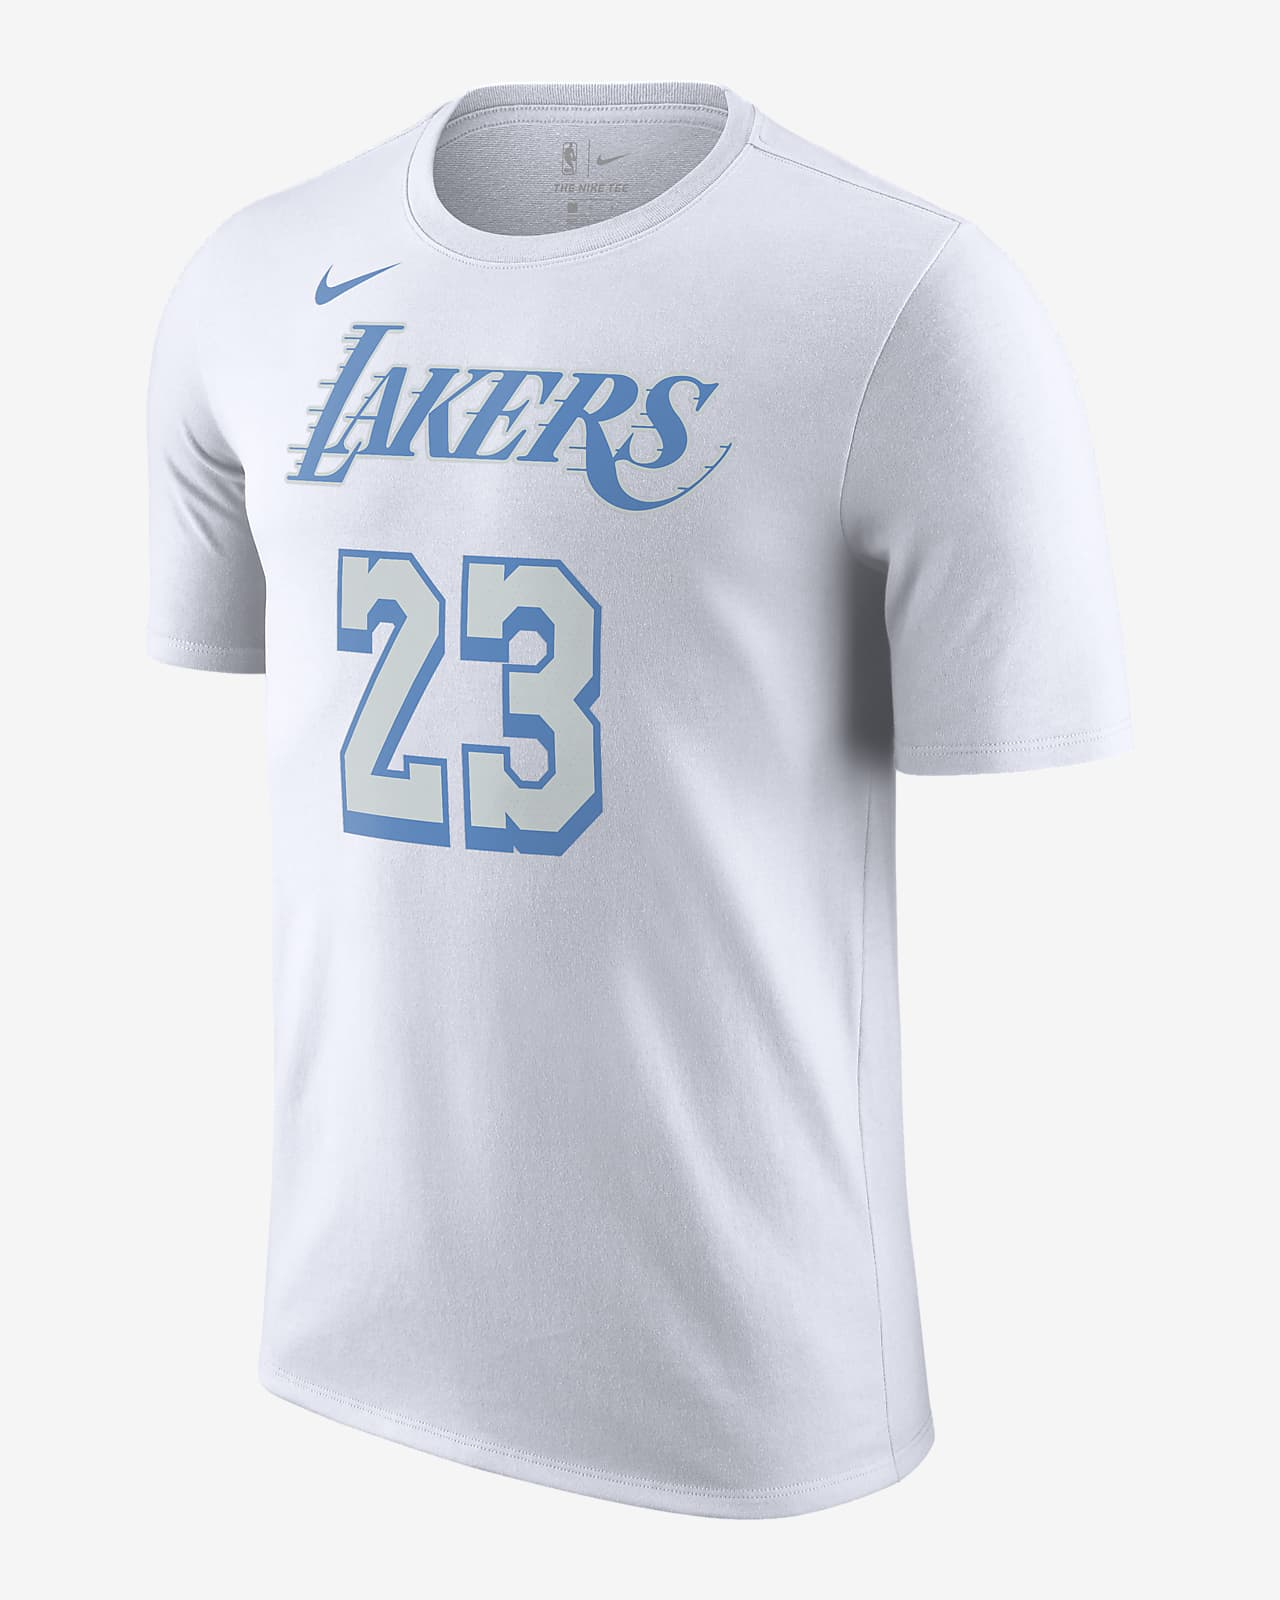 Los Angeles Lakers City Edition Men's Nike NBA T-Shirt